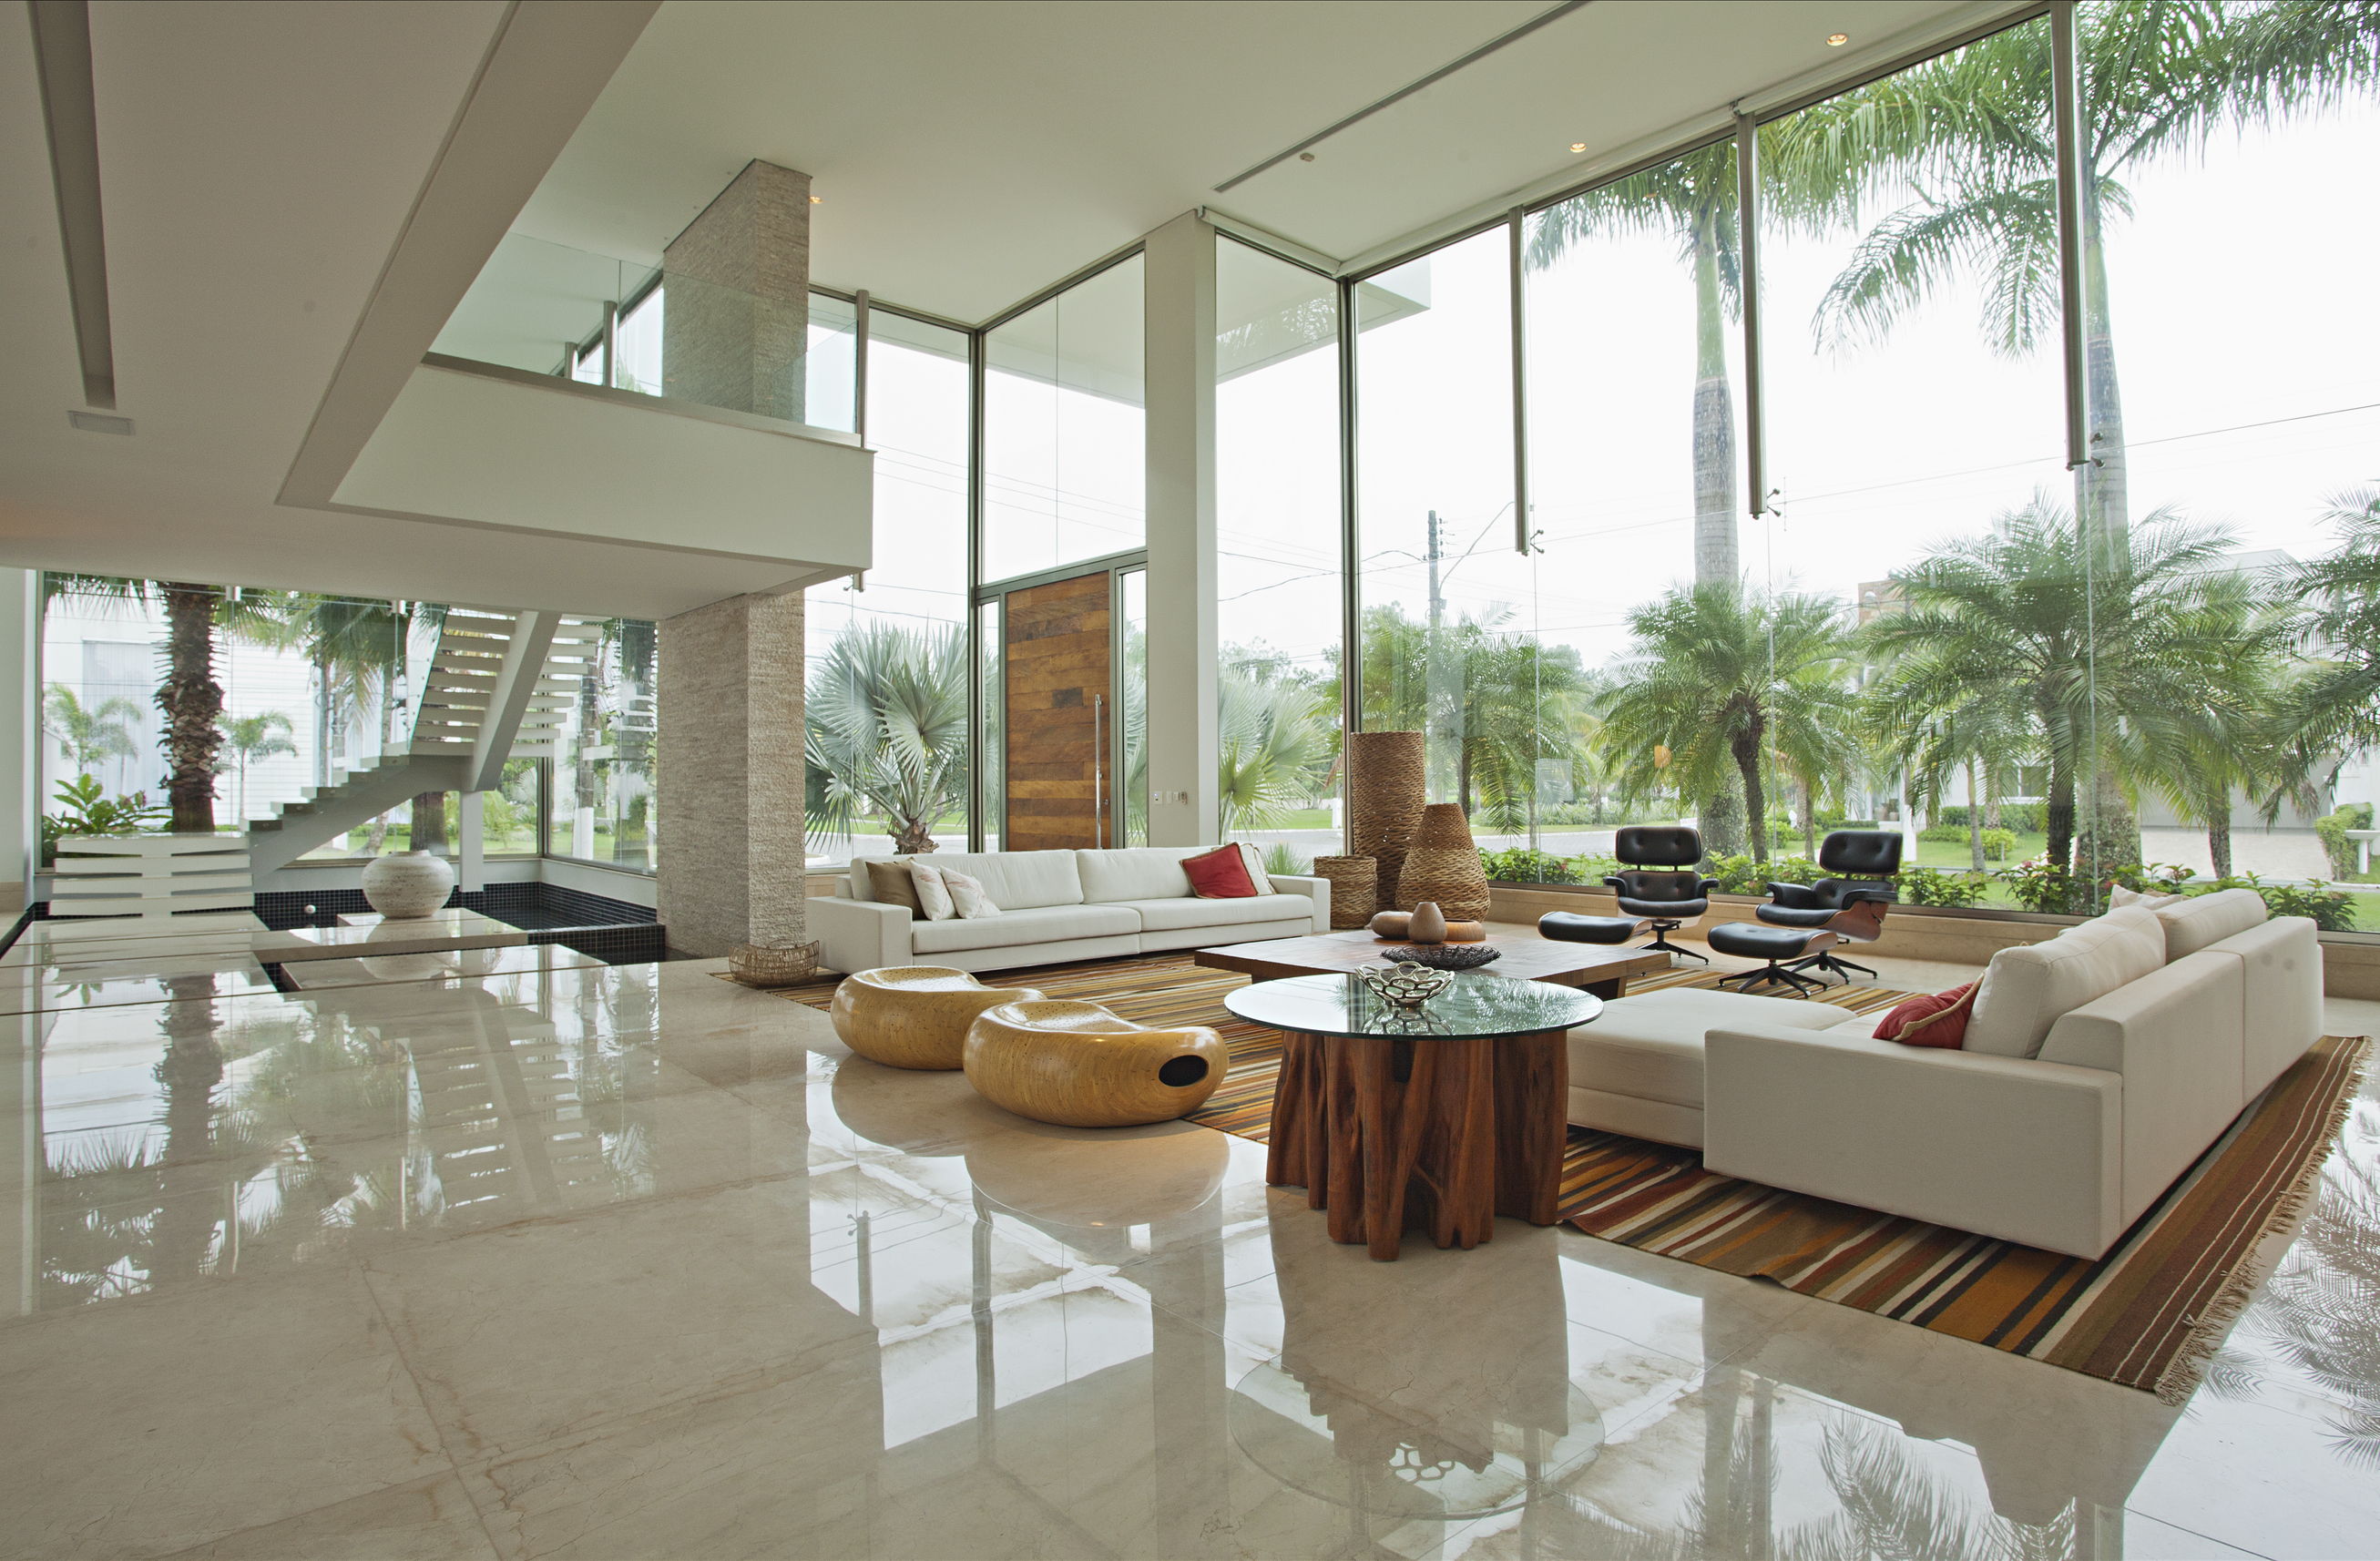 Tek Ailelik Ev için Satış at Luxury Beach House Rua Noventra e três Guaruja, Sao Paulo, 11445785 Brezilya